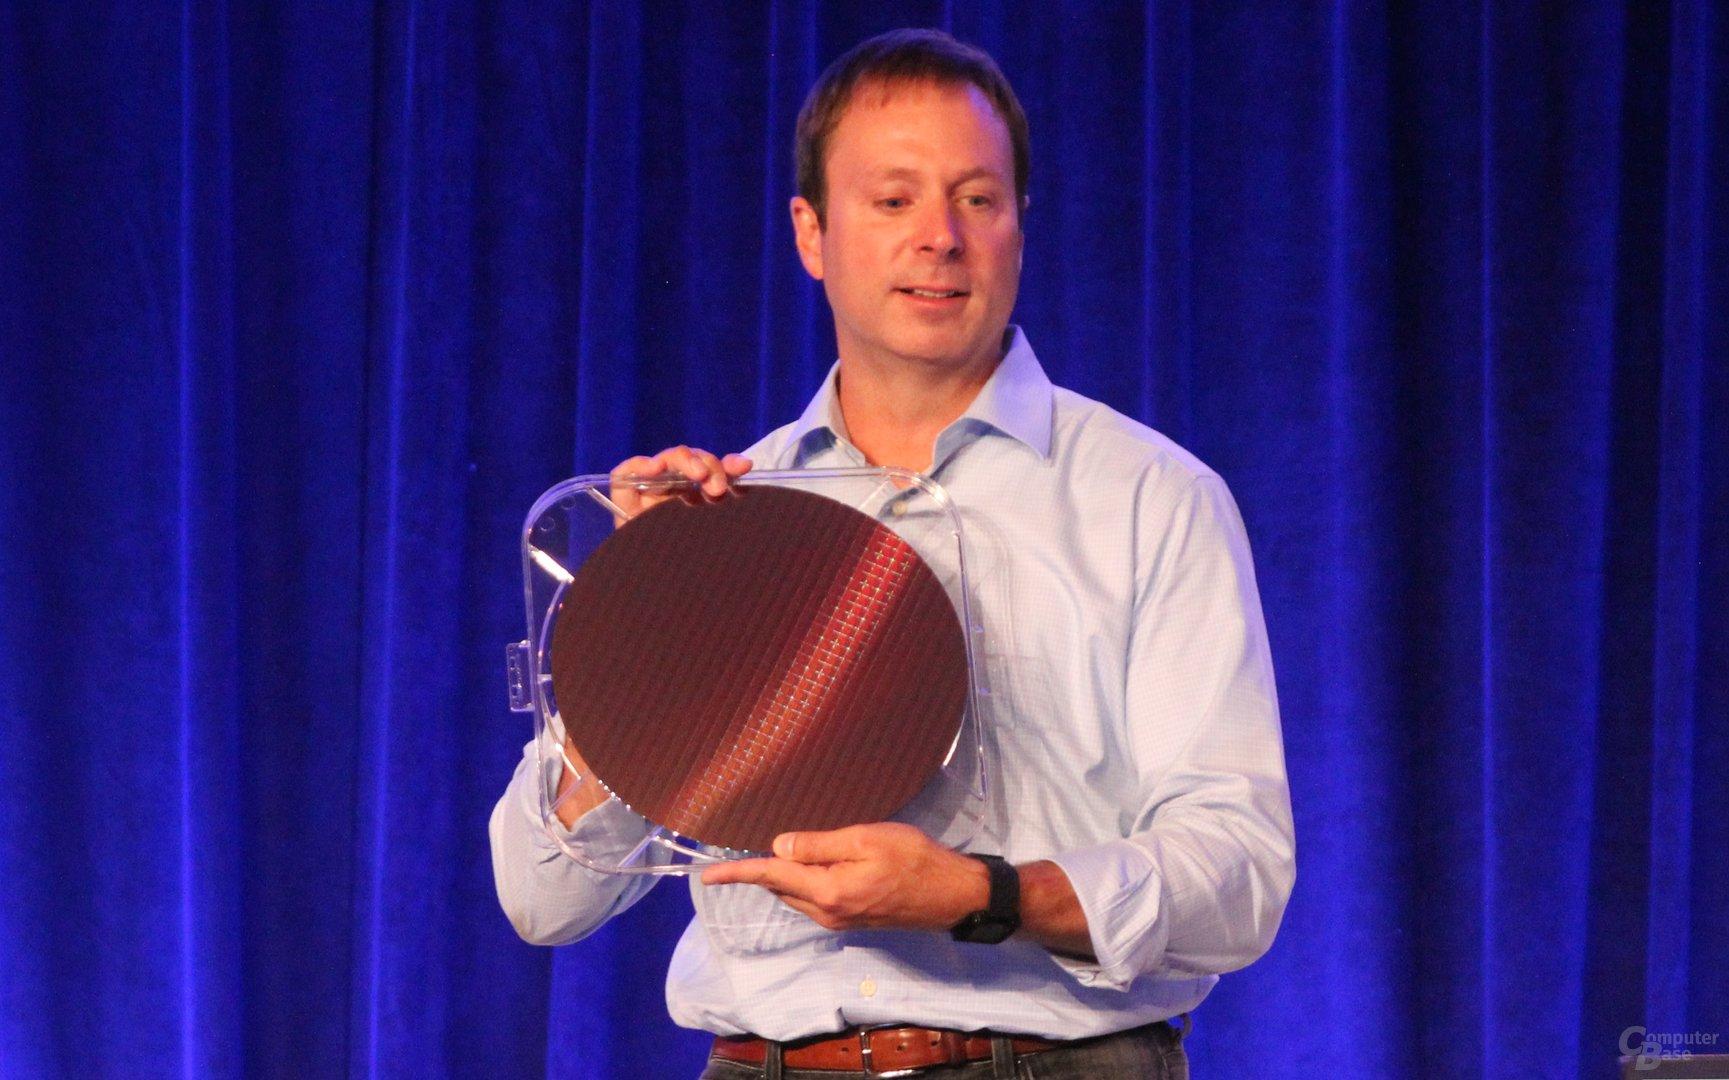 Kirk Skaugen, General Manager der Client Computing Group, mit Skylake-Wafer